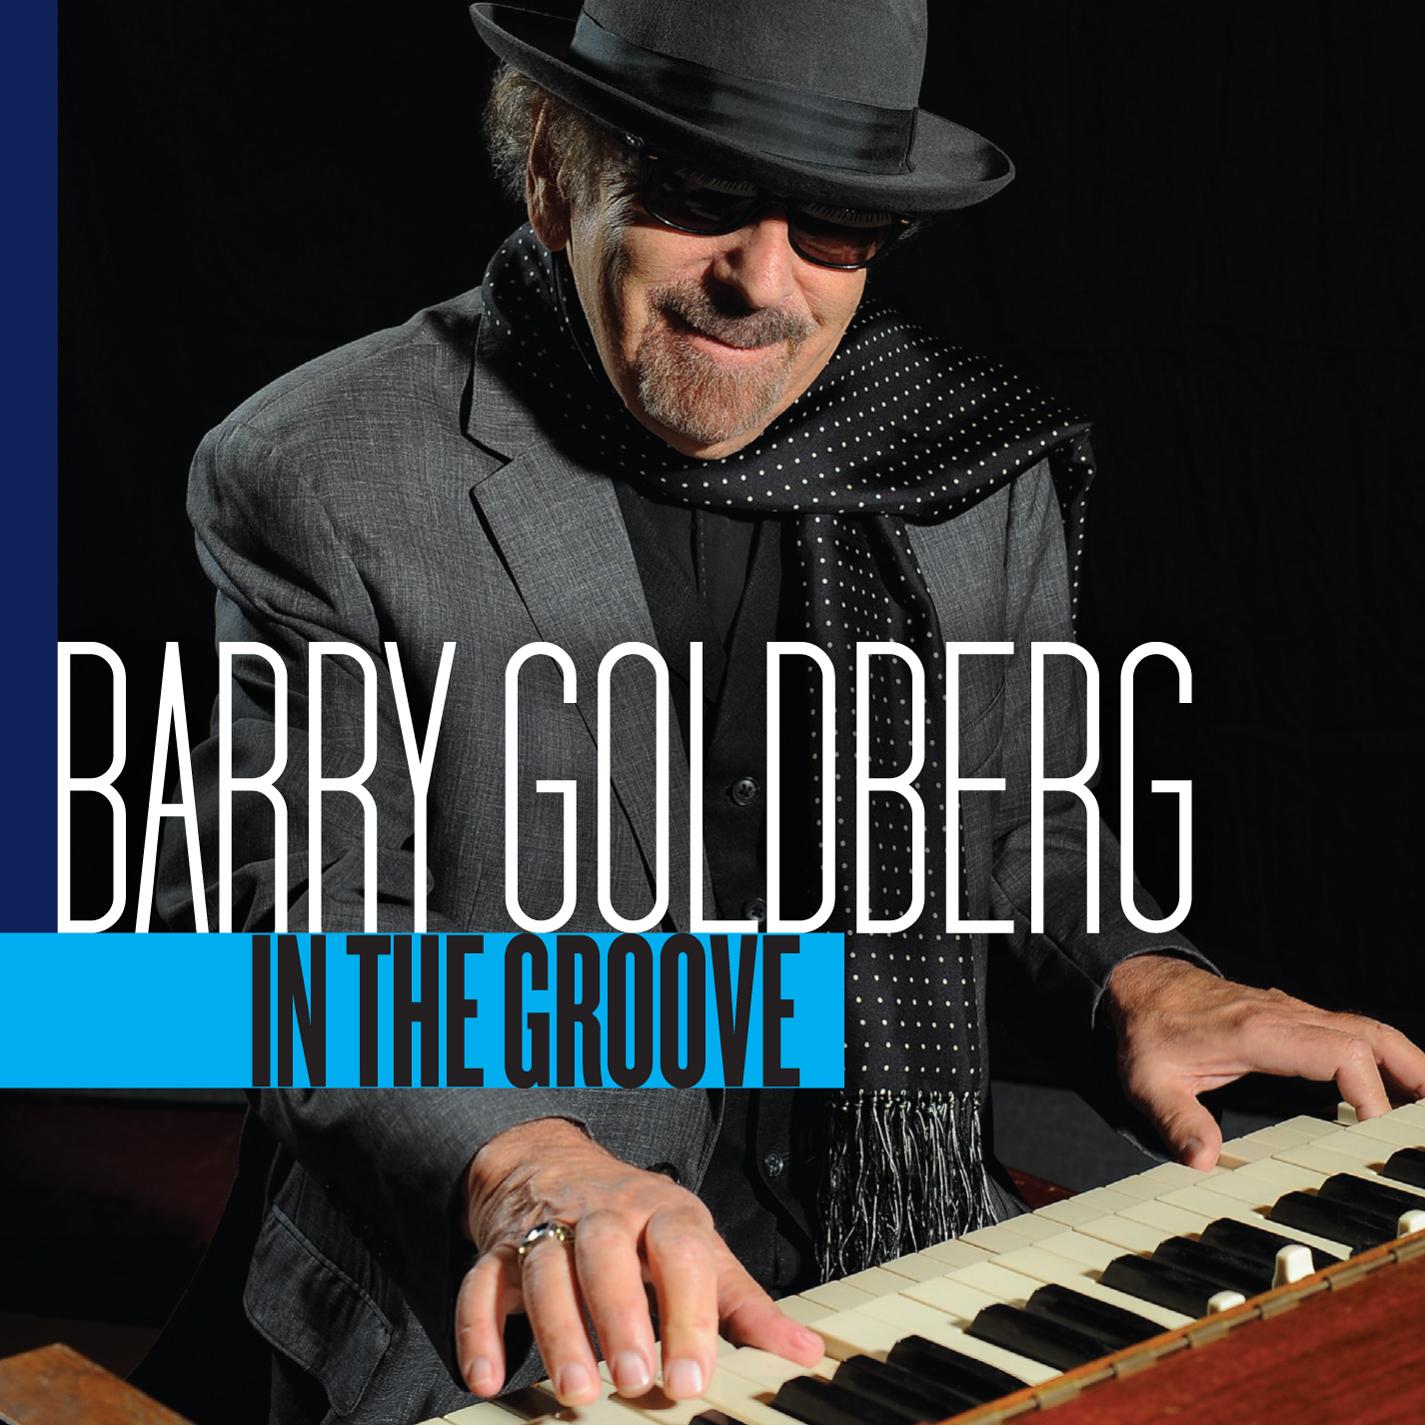 Barry Goldberg